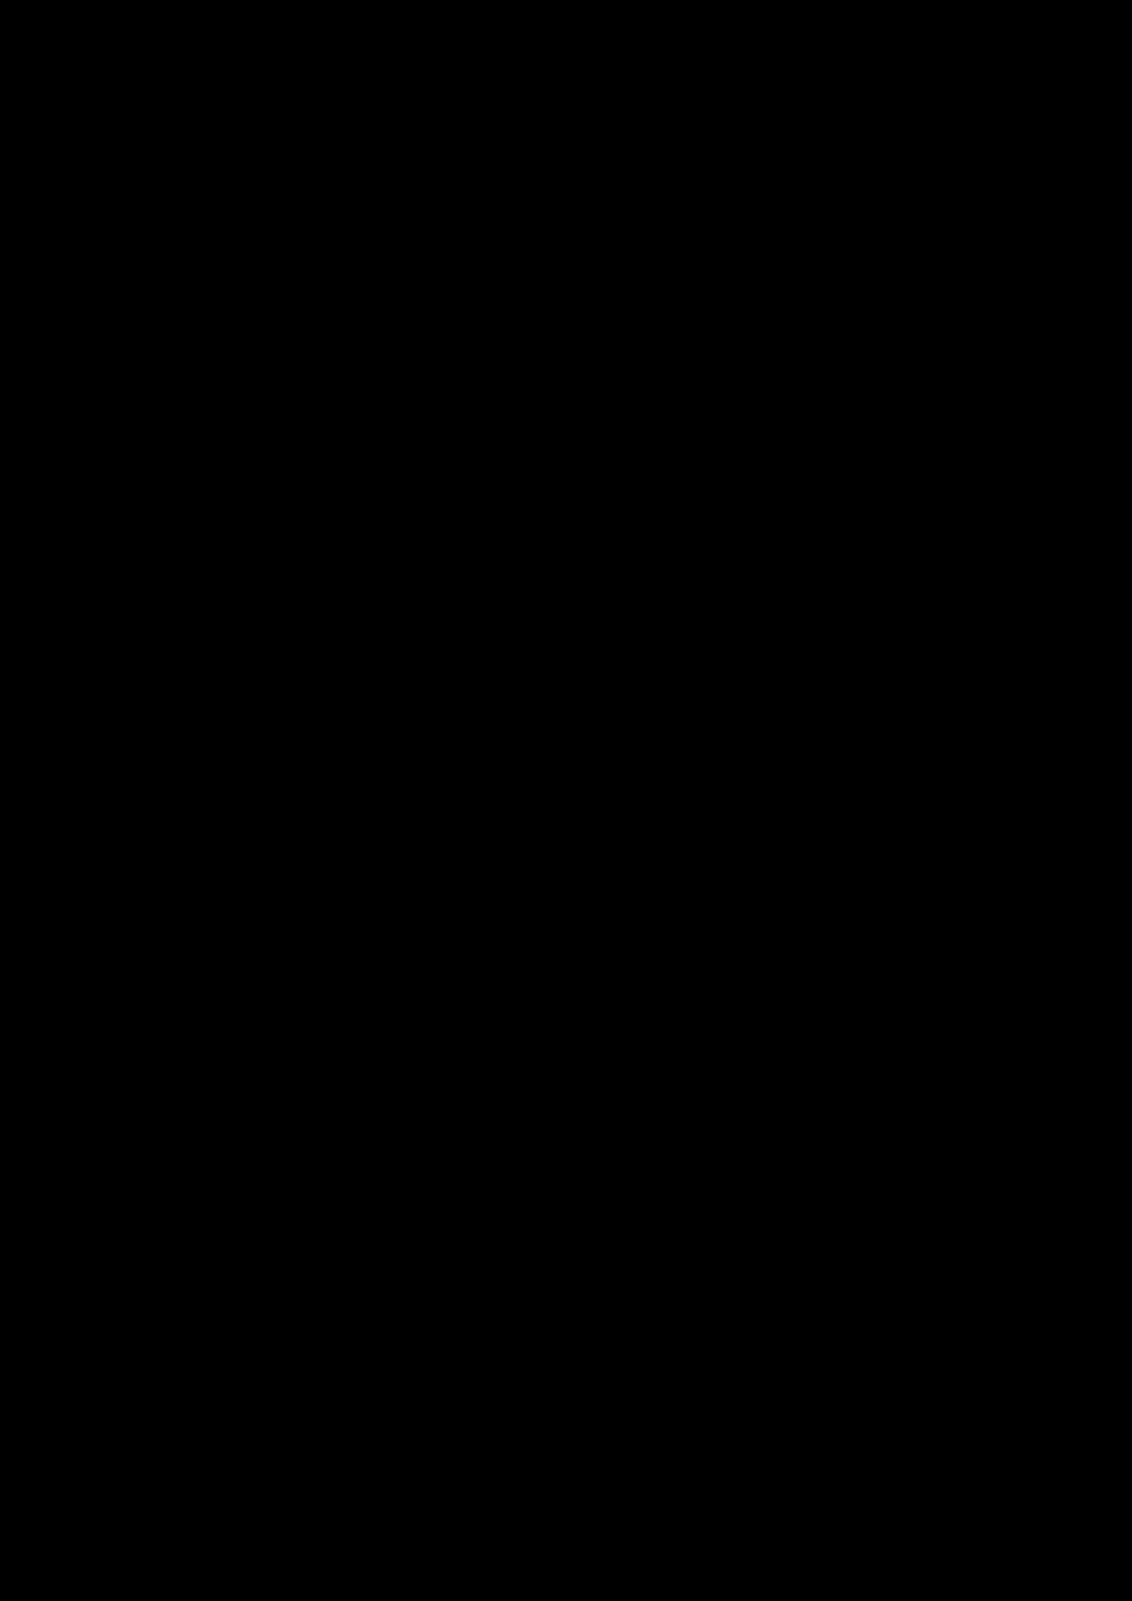 Korolevstvo slez slide, Image 54